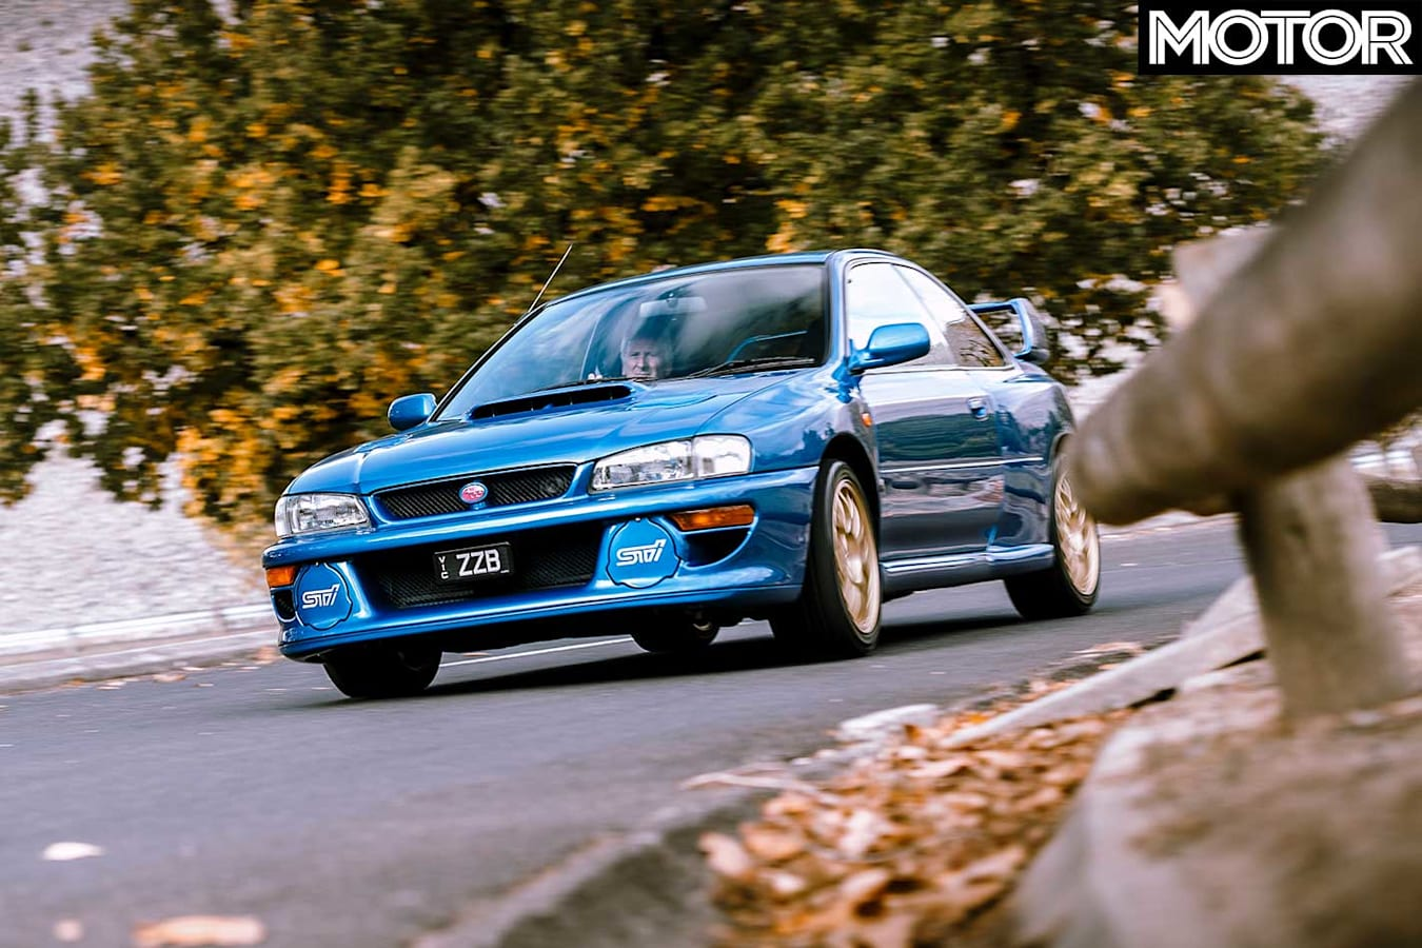 1998 Subaru Impreza WRX S Ti 22 B Front Jpg